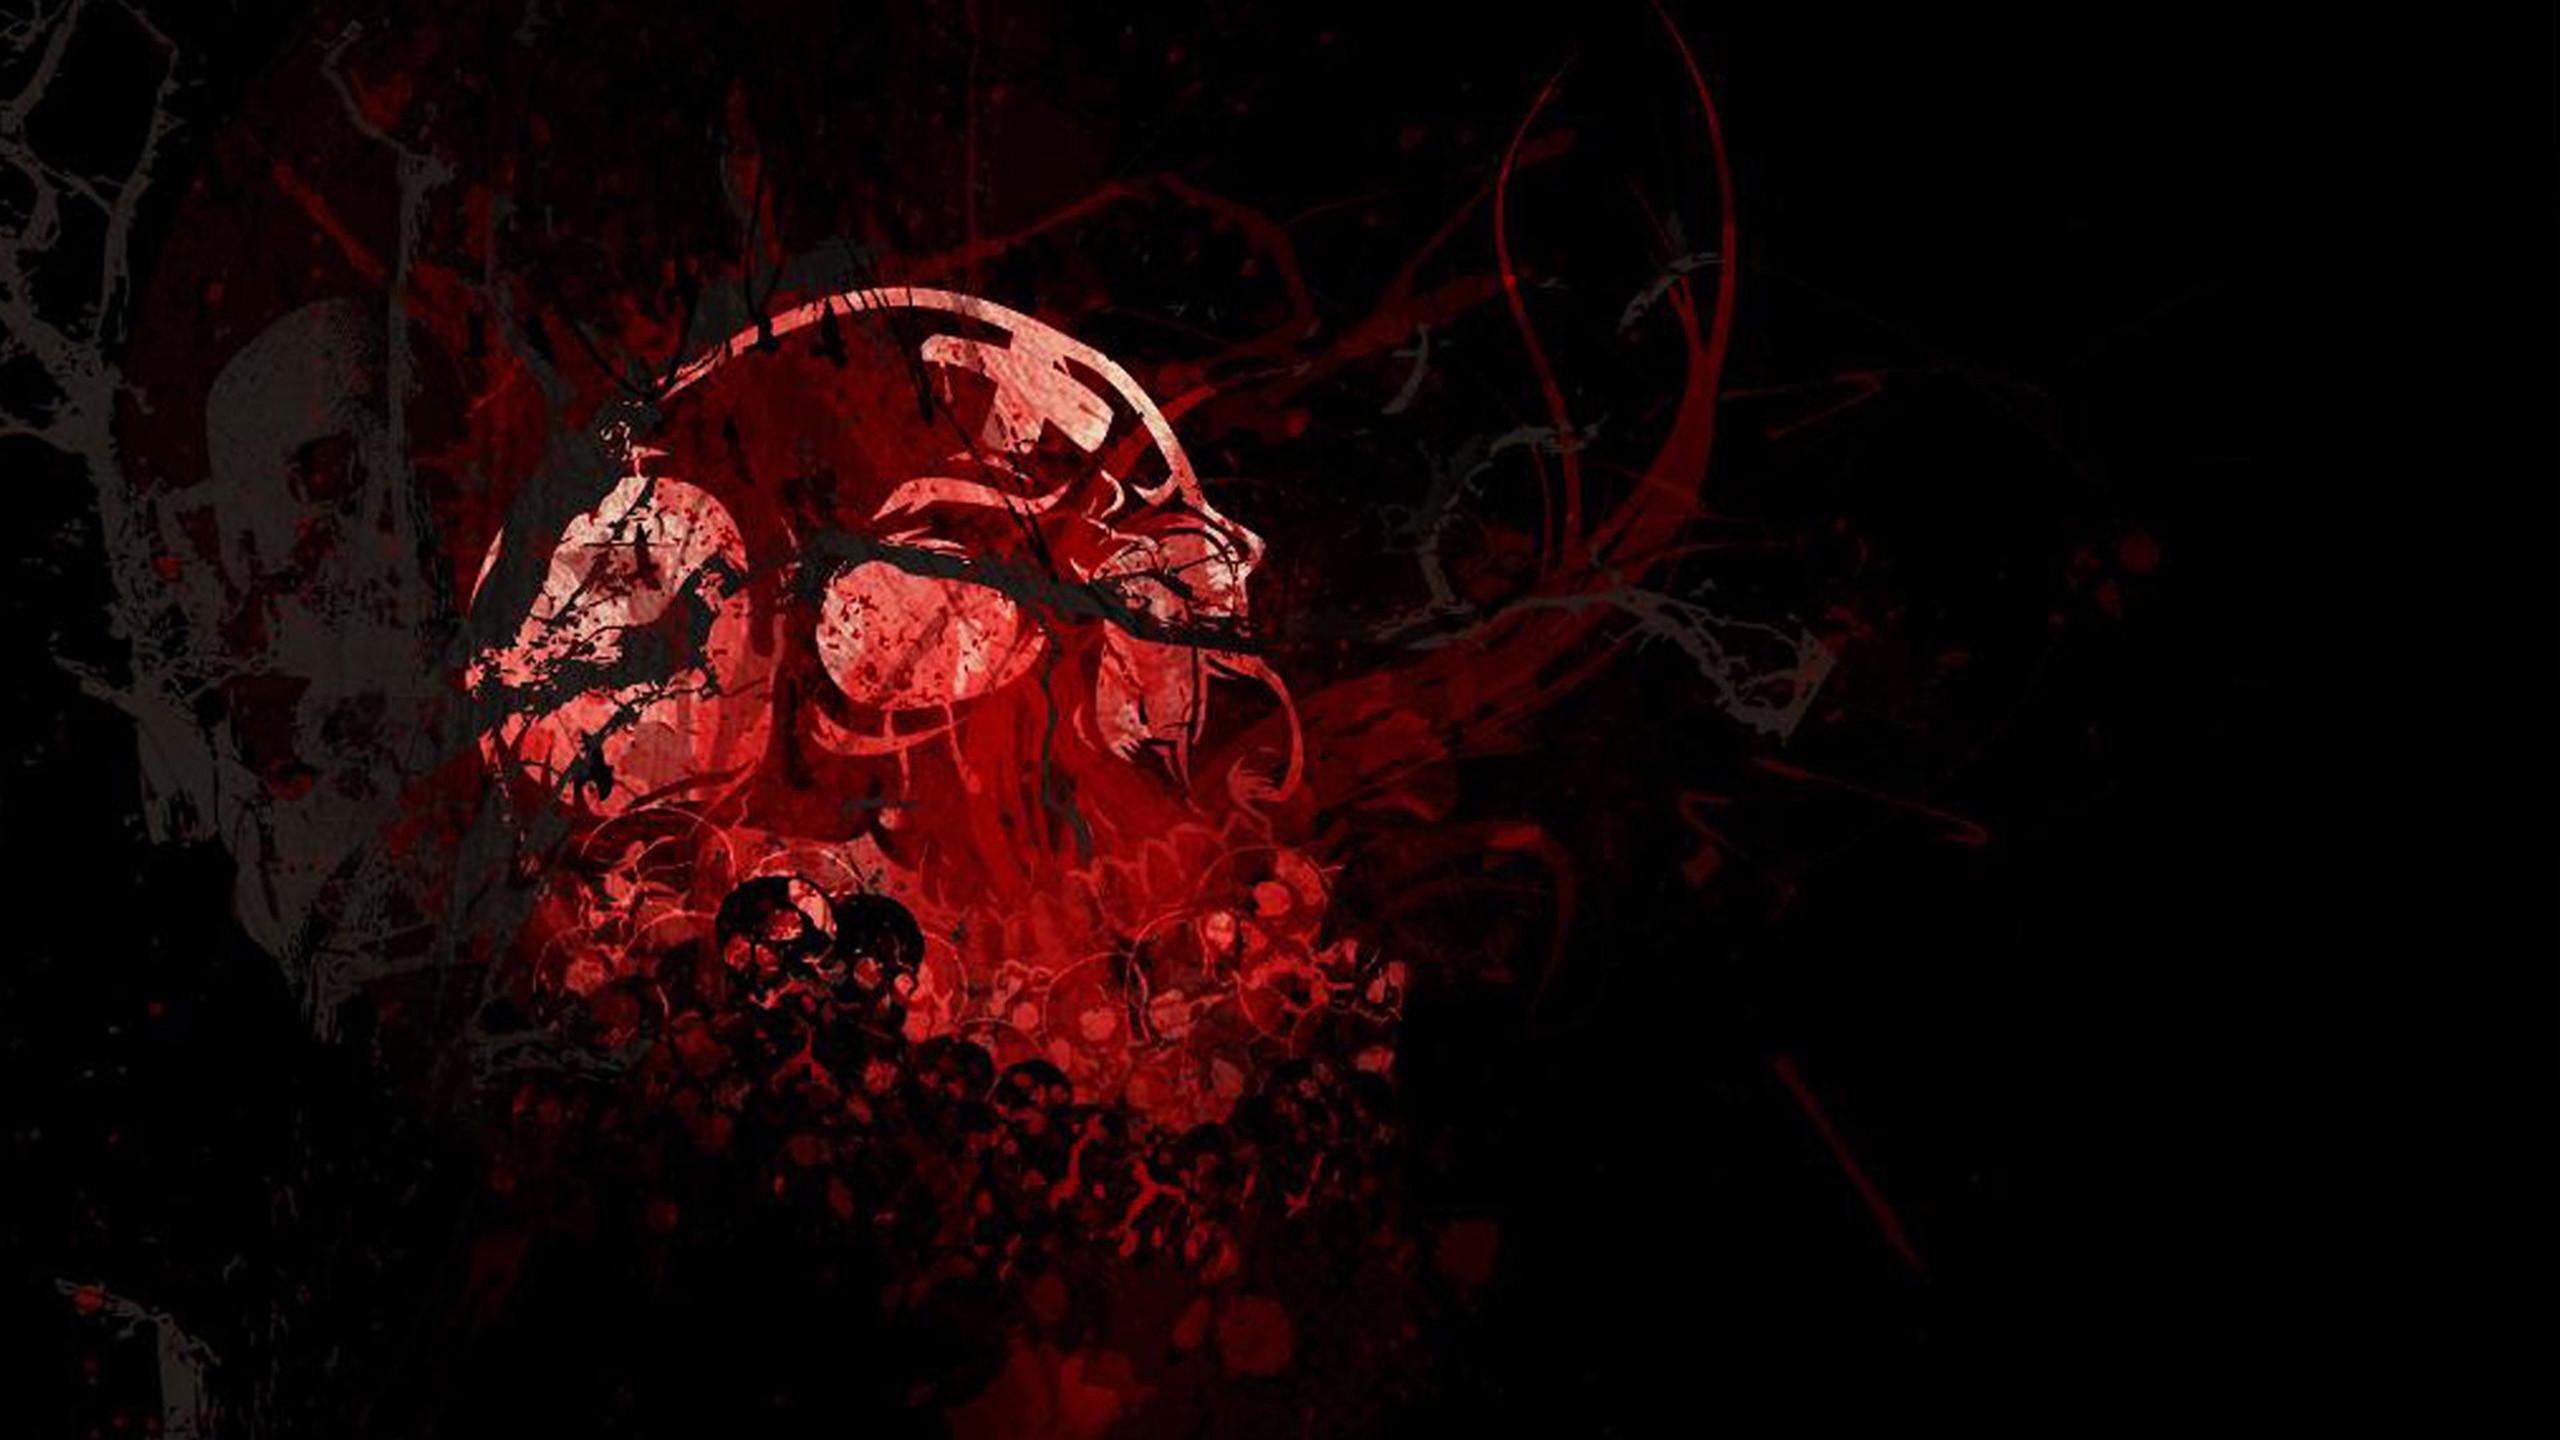 1920x1080 Sugar Skull HD Backgrounds Wallpaper Wp6409772